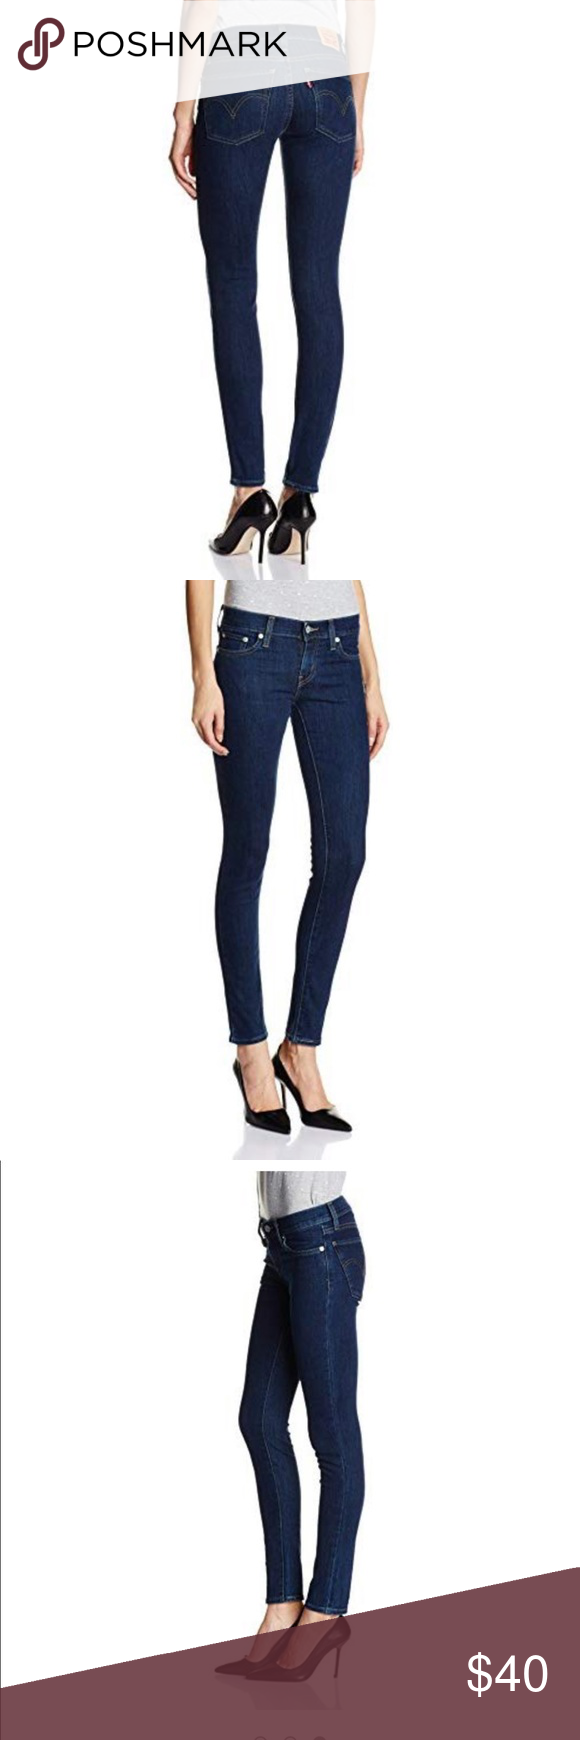 Levis 601 Pin Skinny Fit Jeans Levis Size : 27 68% Cotton